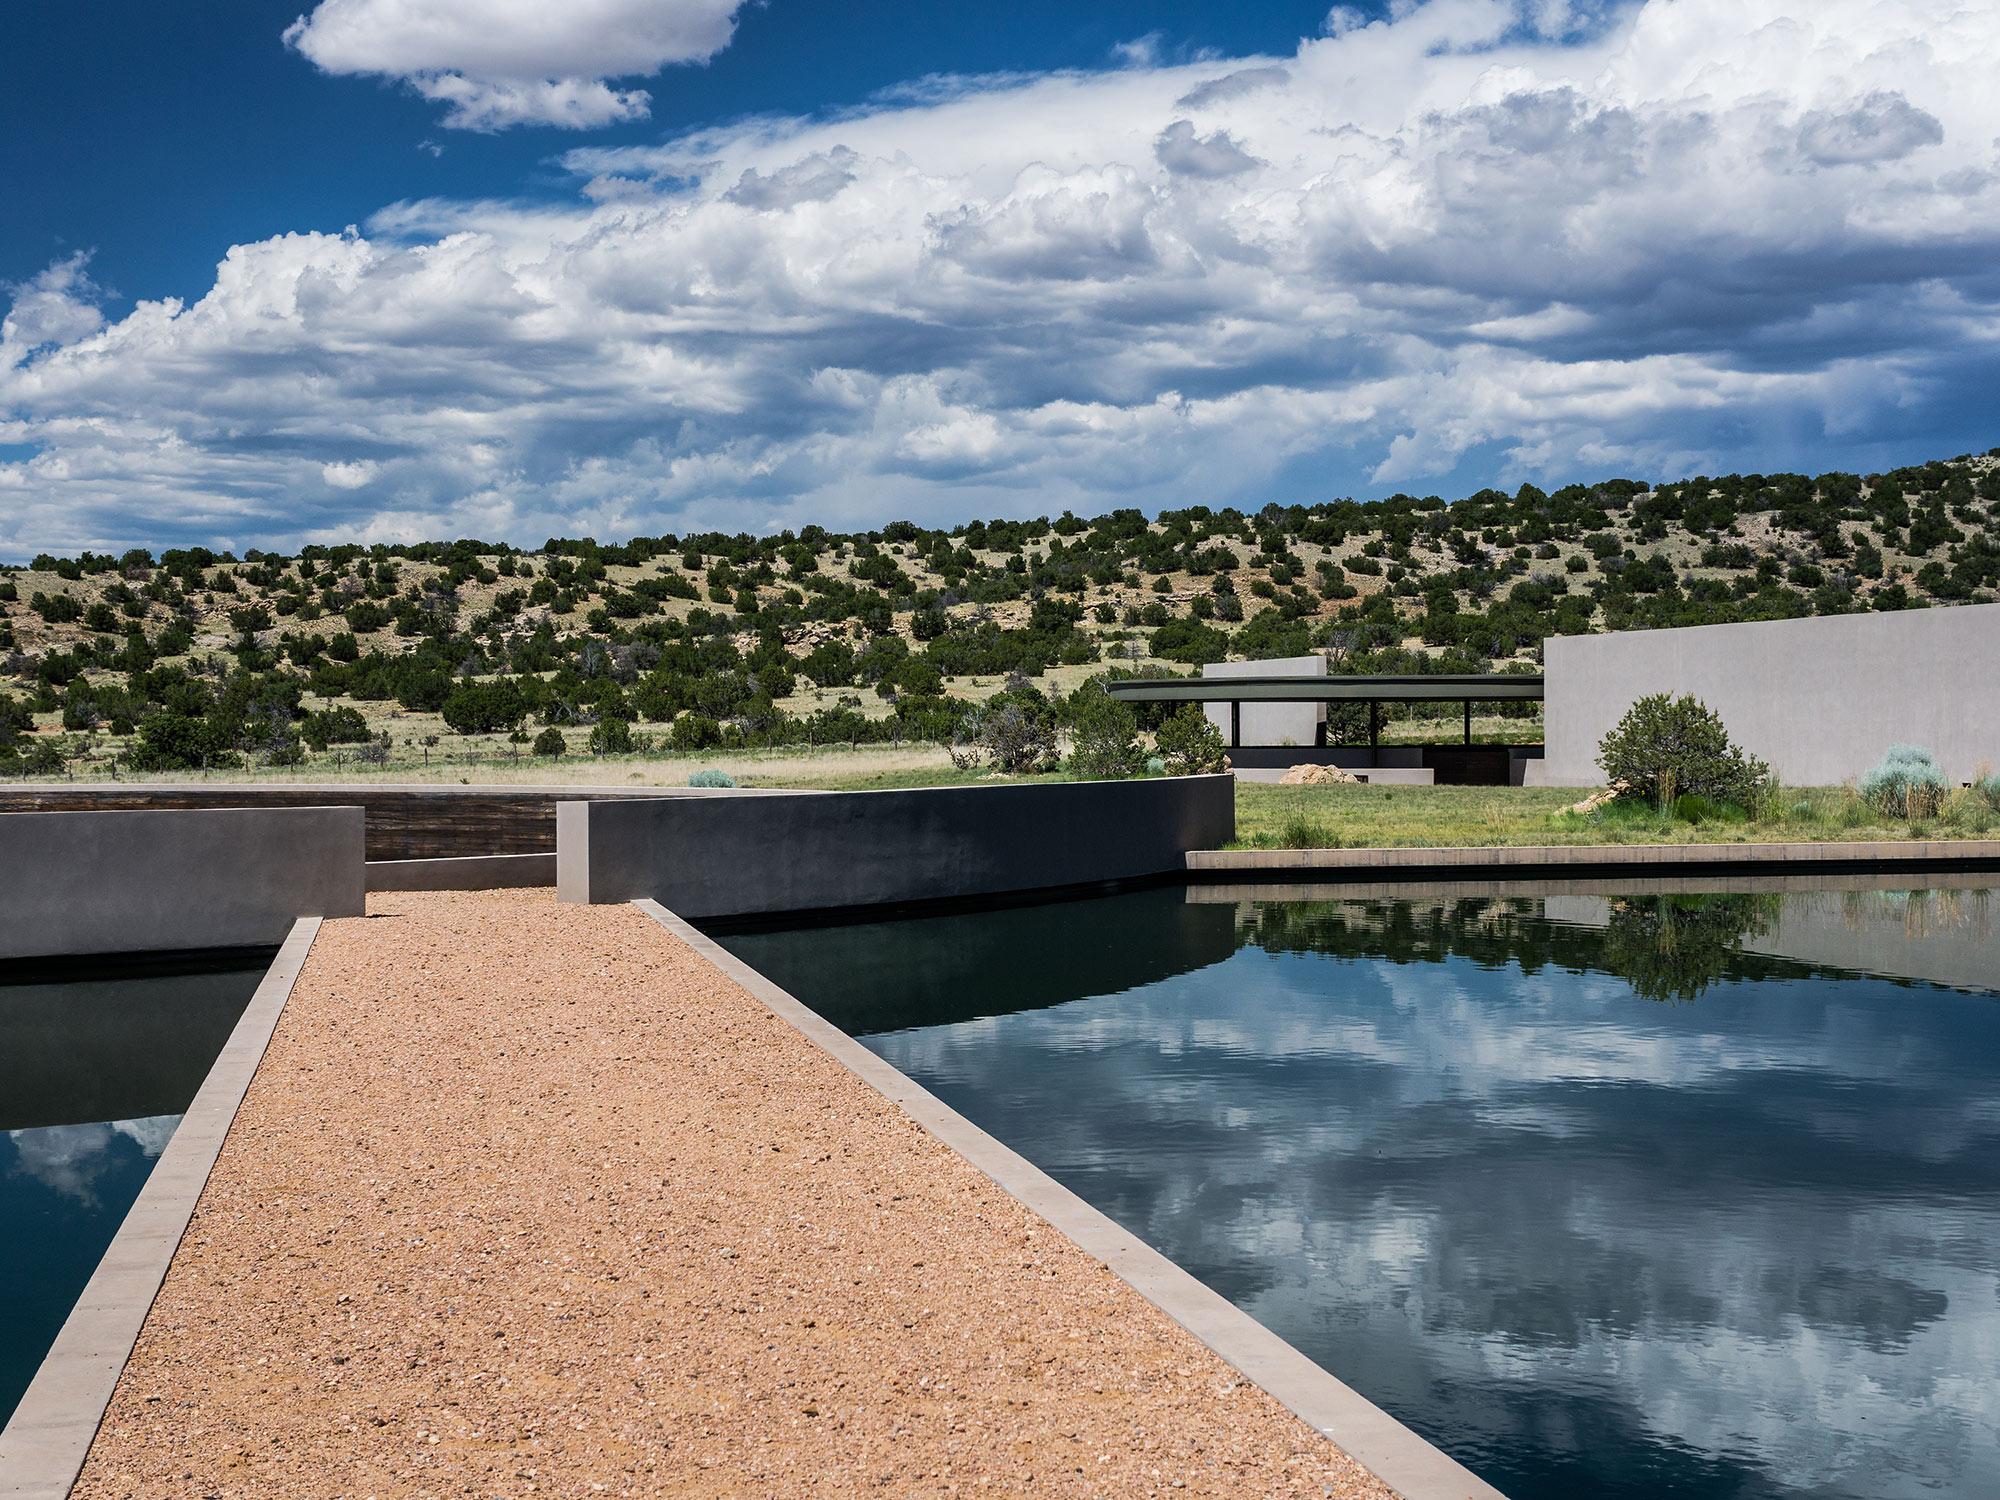 Tom Ford's Cerro Pelon Ranch in Santa Fe by Tadao Ando